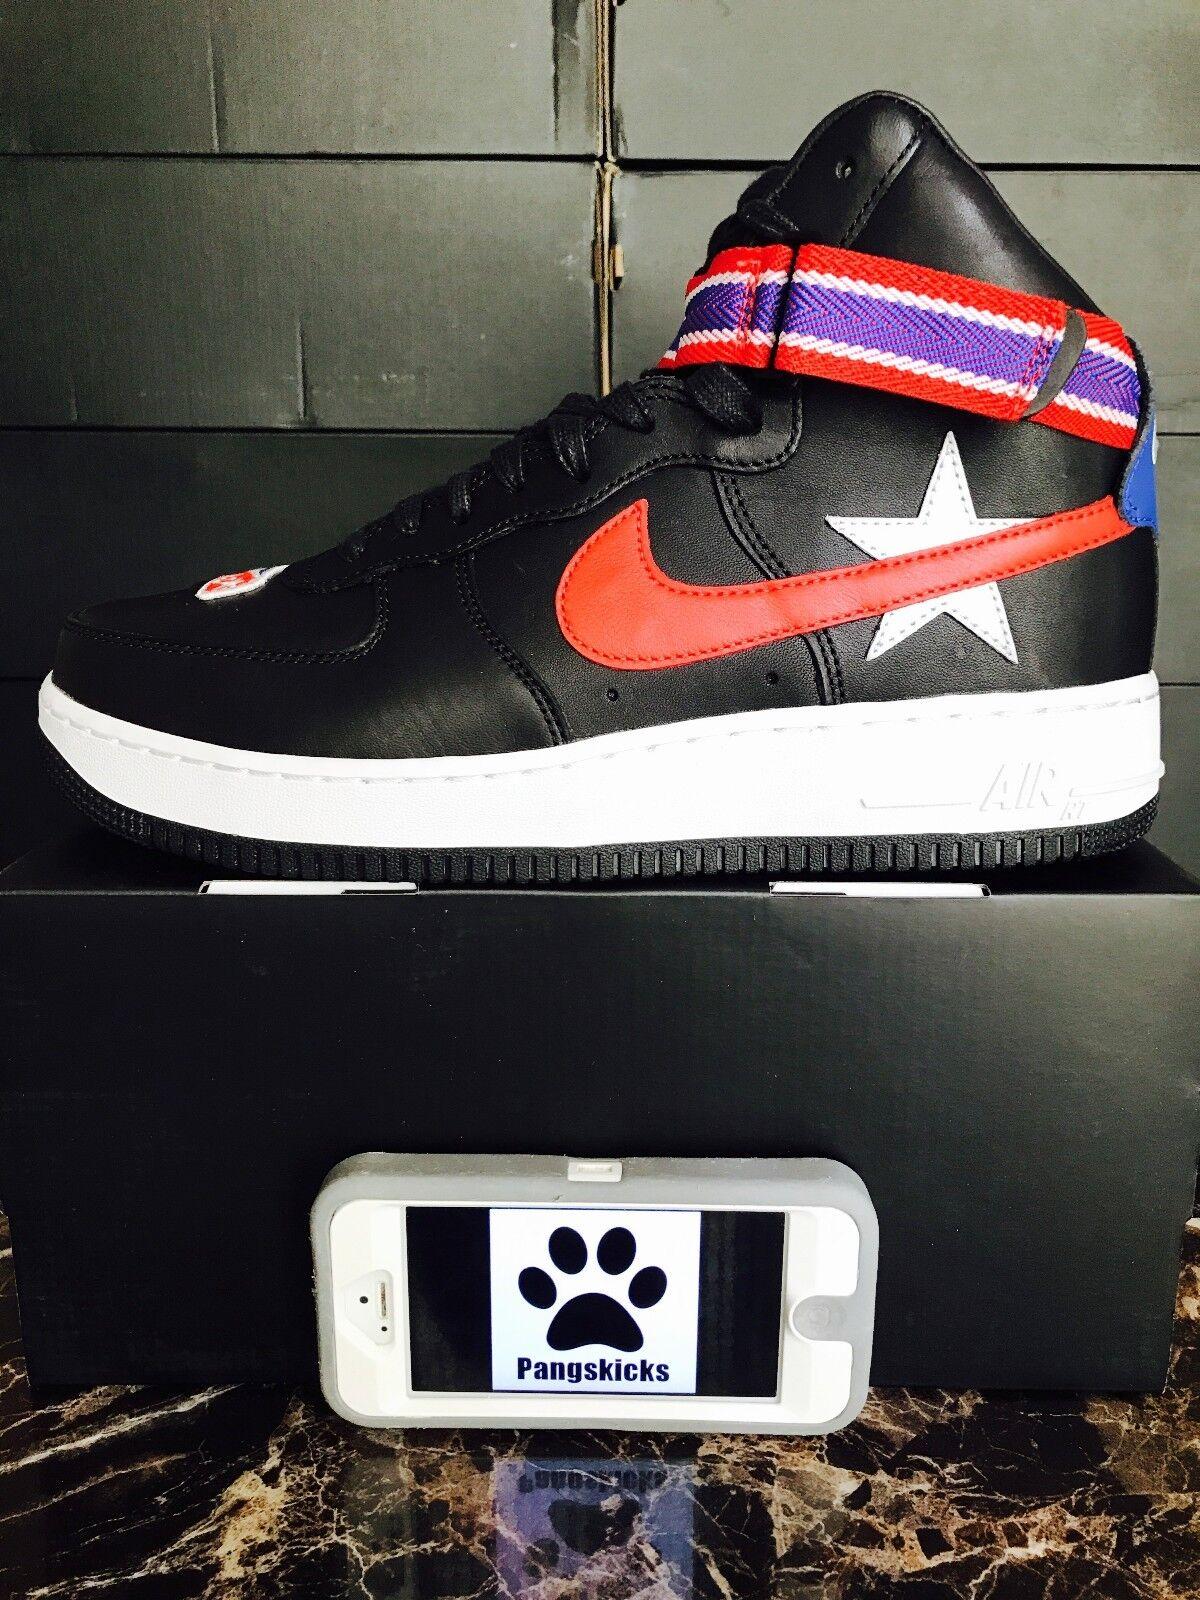 Nike air force di alto nikelab x rt riccardo tisci nero aq3366-001 misura 9 - 10